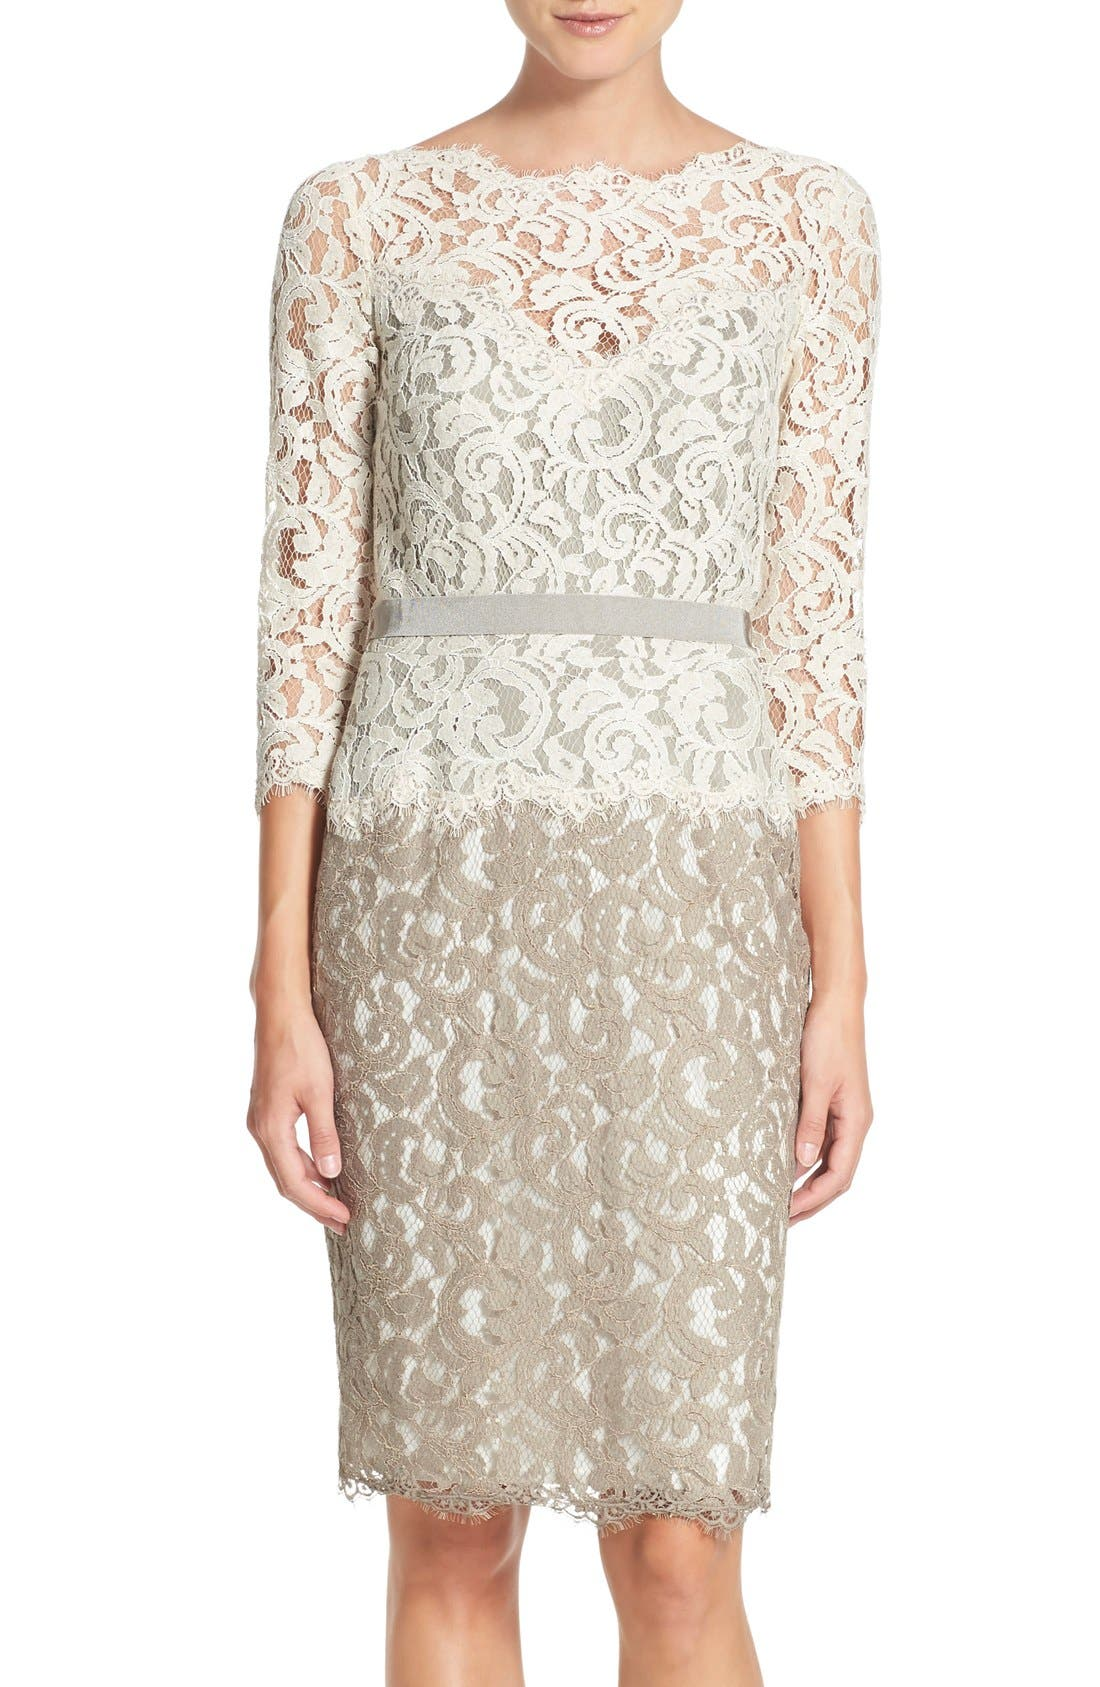 Alternate Image 1 Selected - Tadashi Shoji Two-Tone Lace Sheath Dress (Regular & Petite)